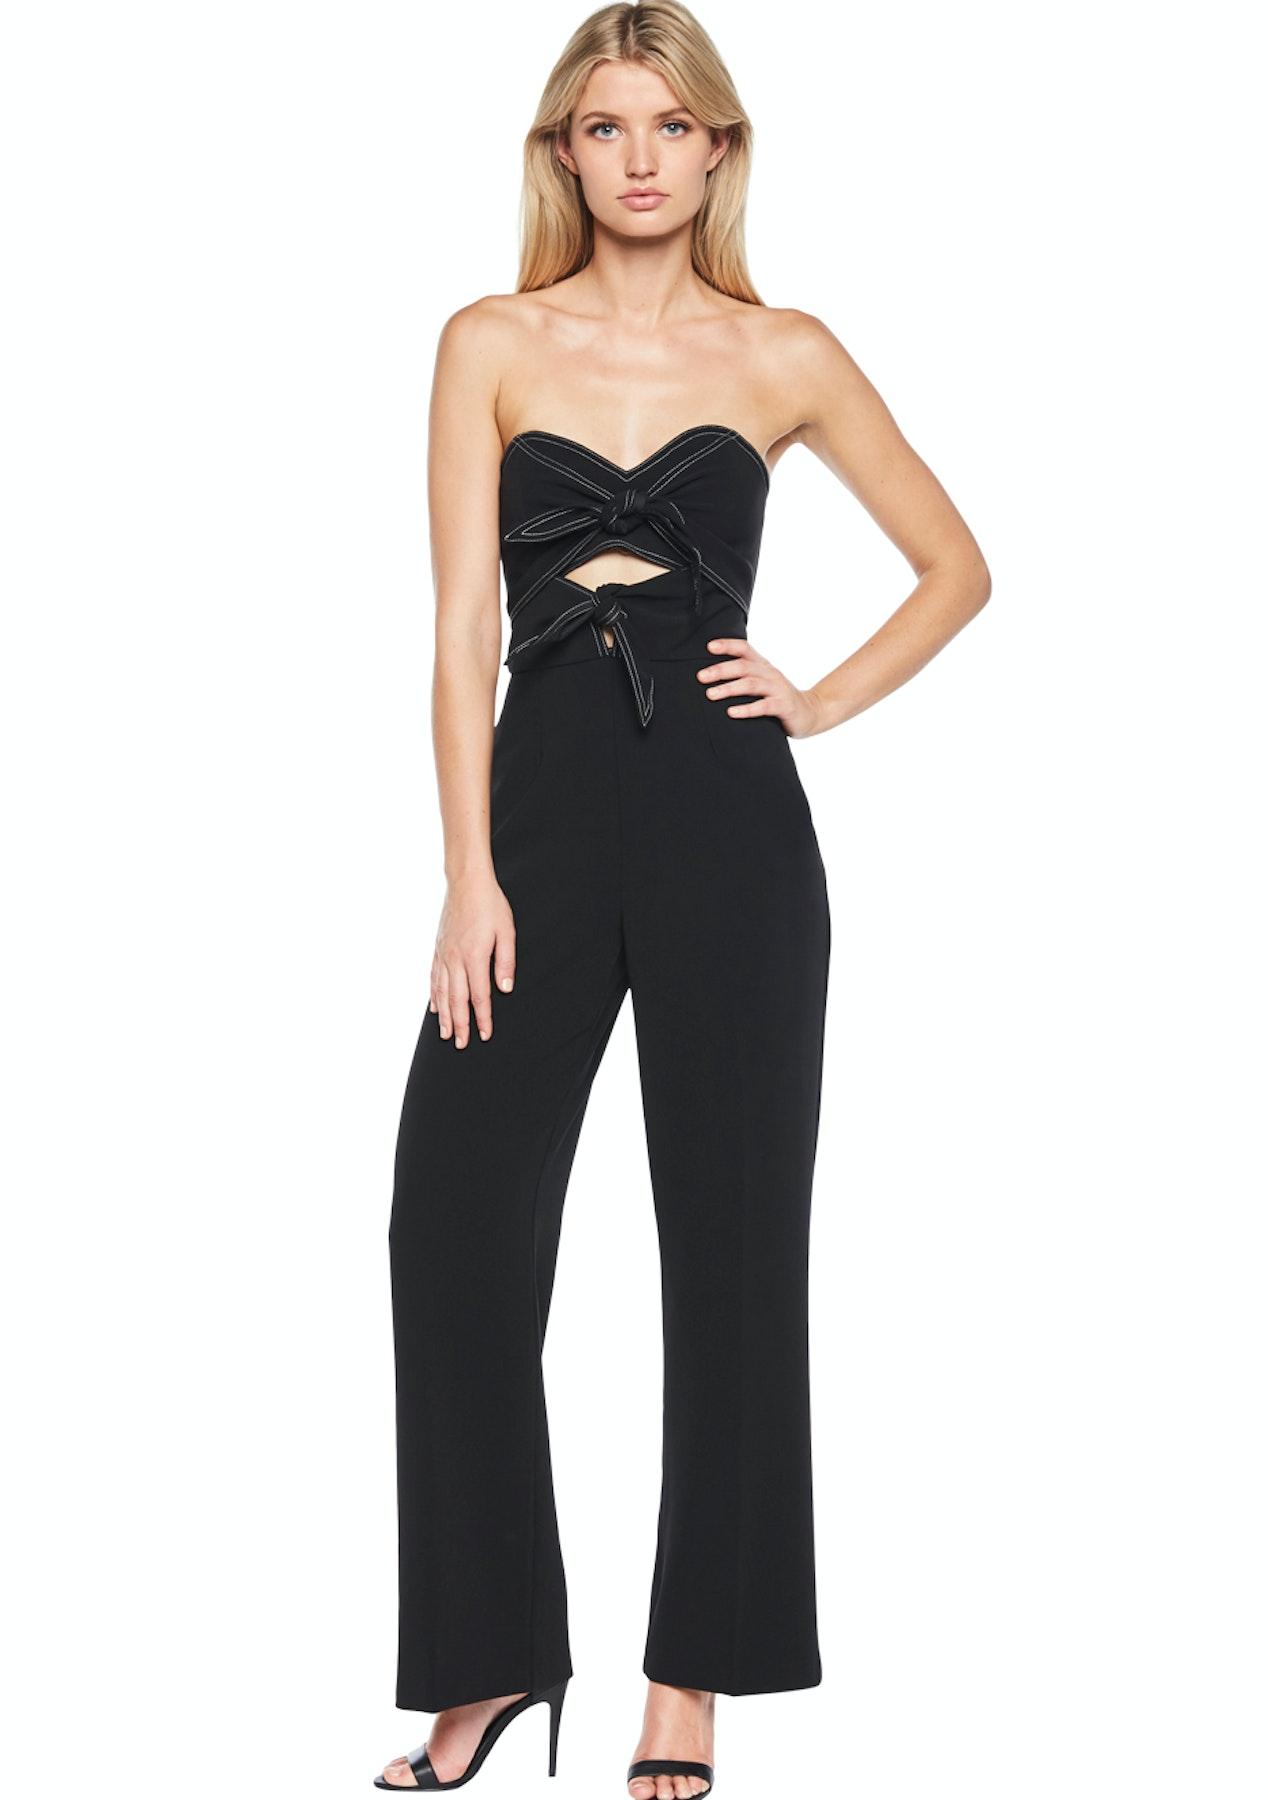 93df2e4ee00 Bardot - Twin Bow Jumpsuit - Black - Designer Garage Sale - Onceit